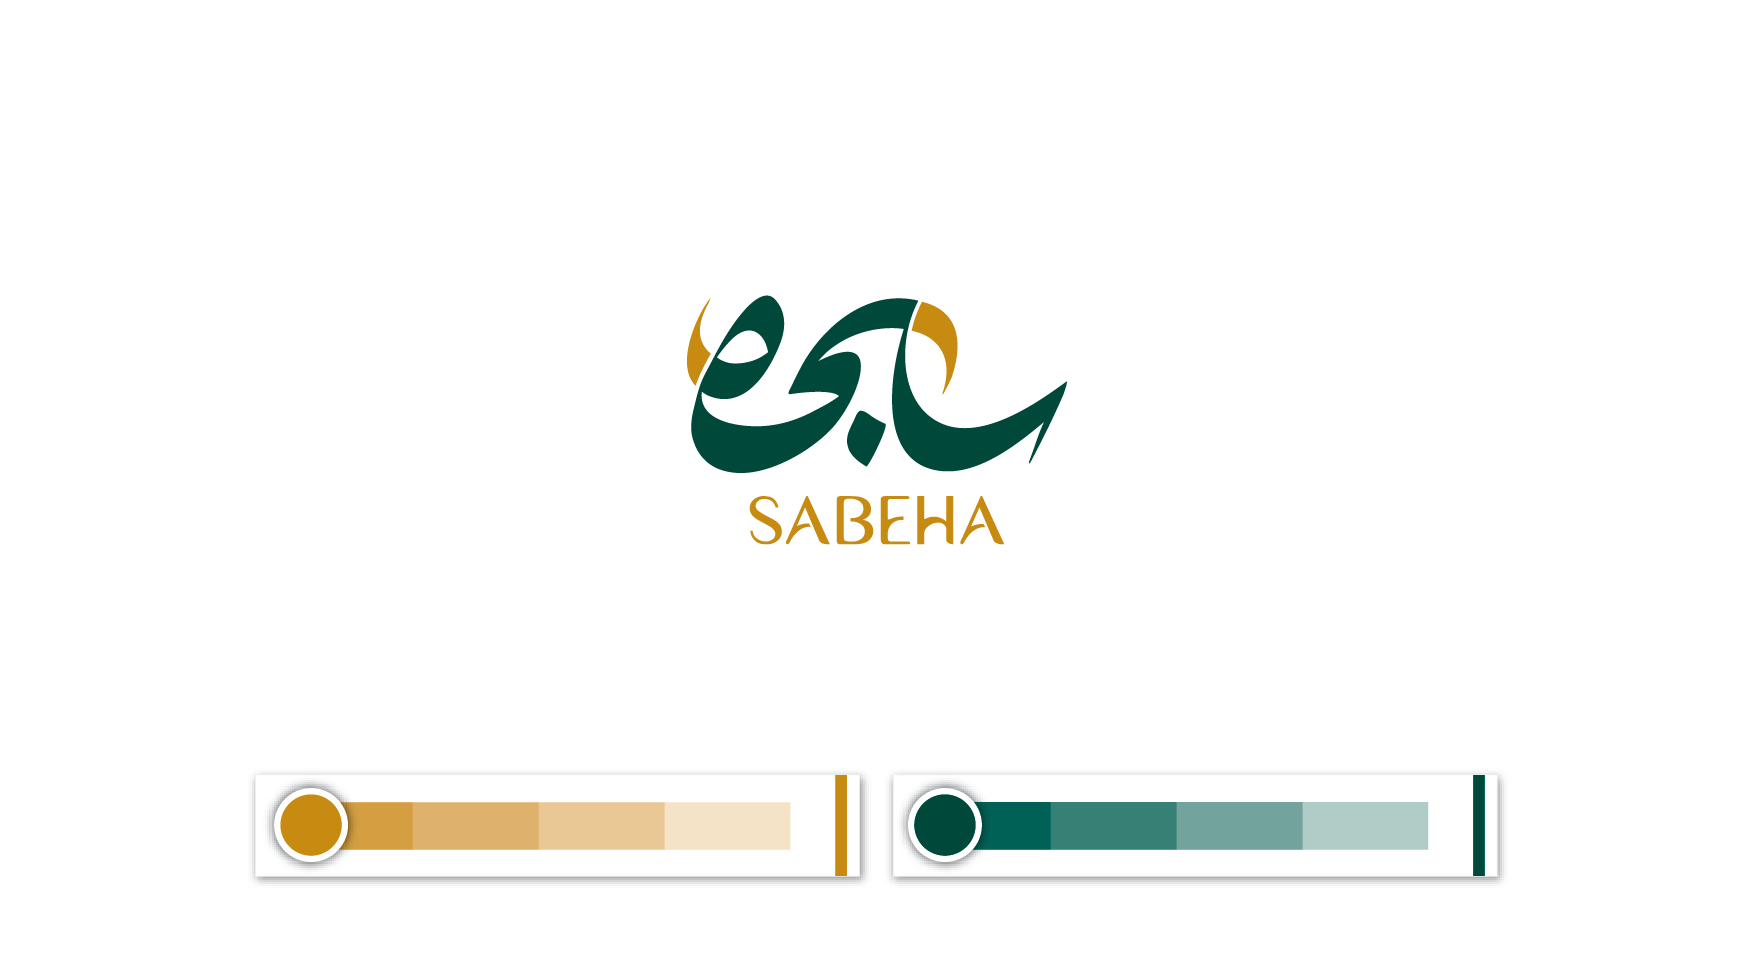 sabeha_behance-04